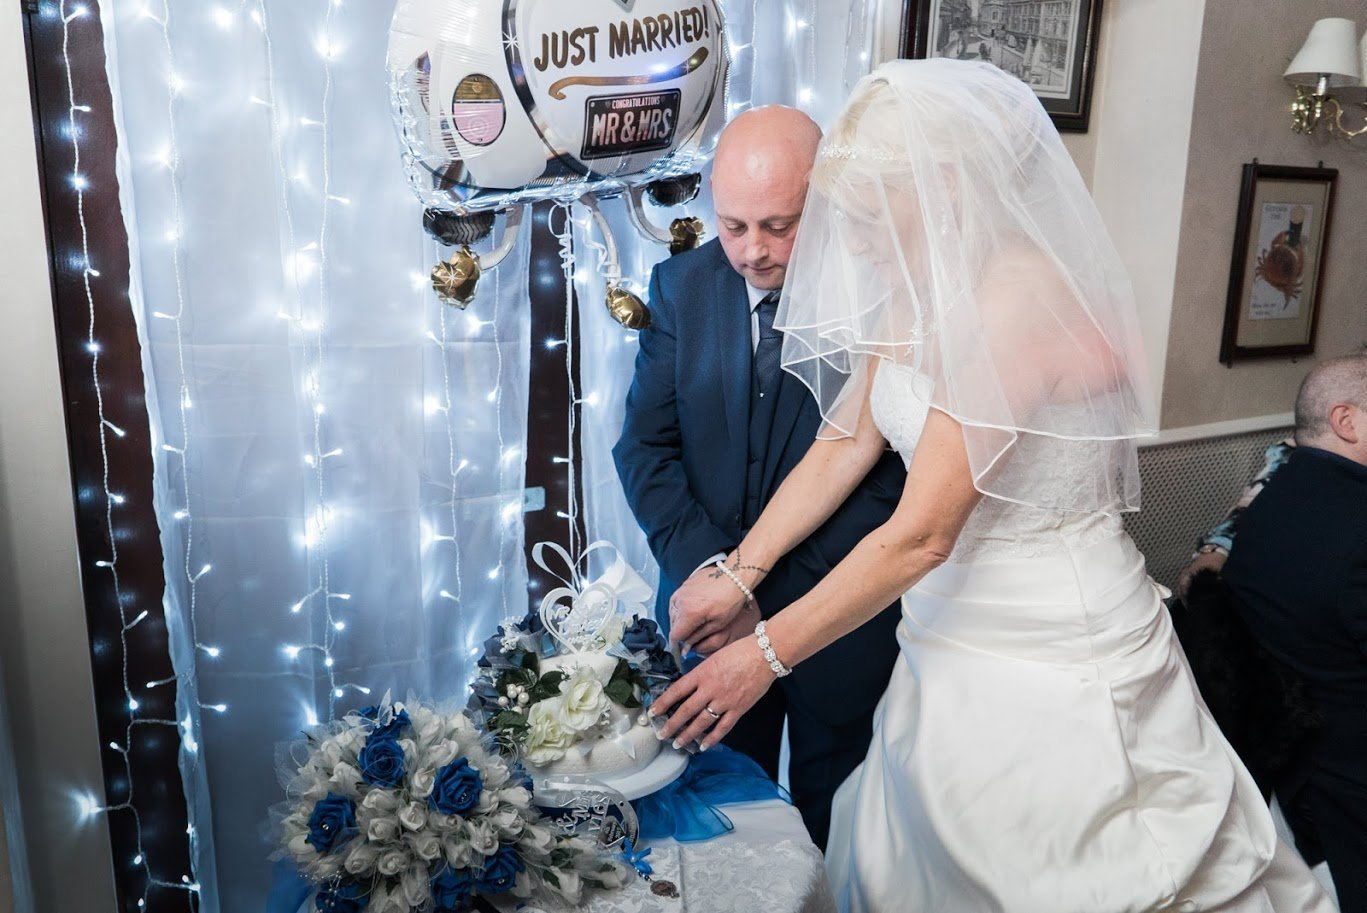 MarkHeather 204006 - Solihull Registry Office Wedding - Mark & Heather